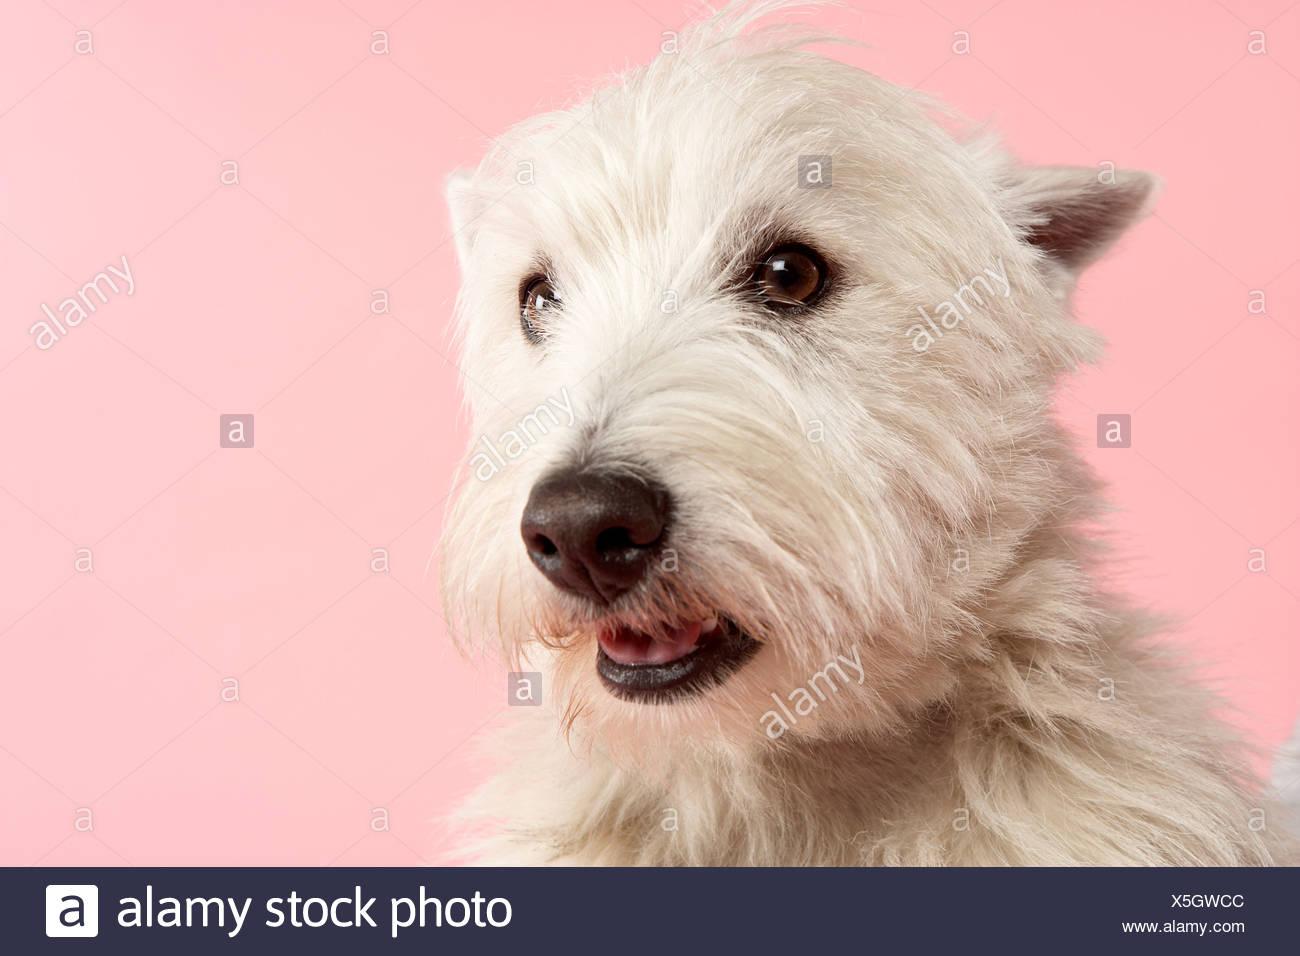 West Highland Terrier Dog In Studio - Stock Image